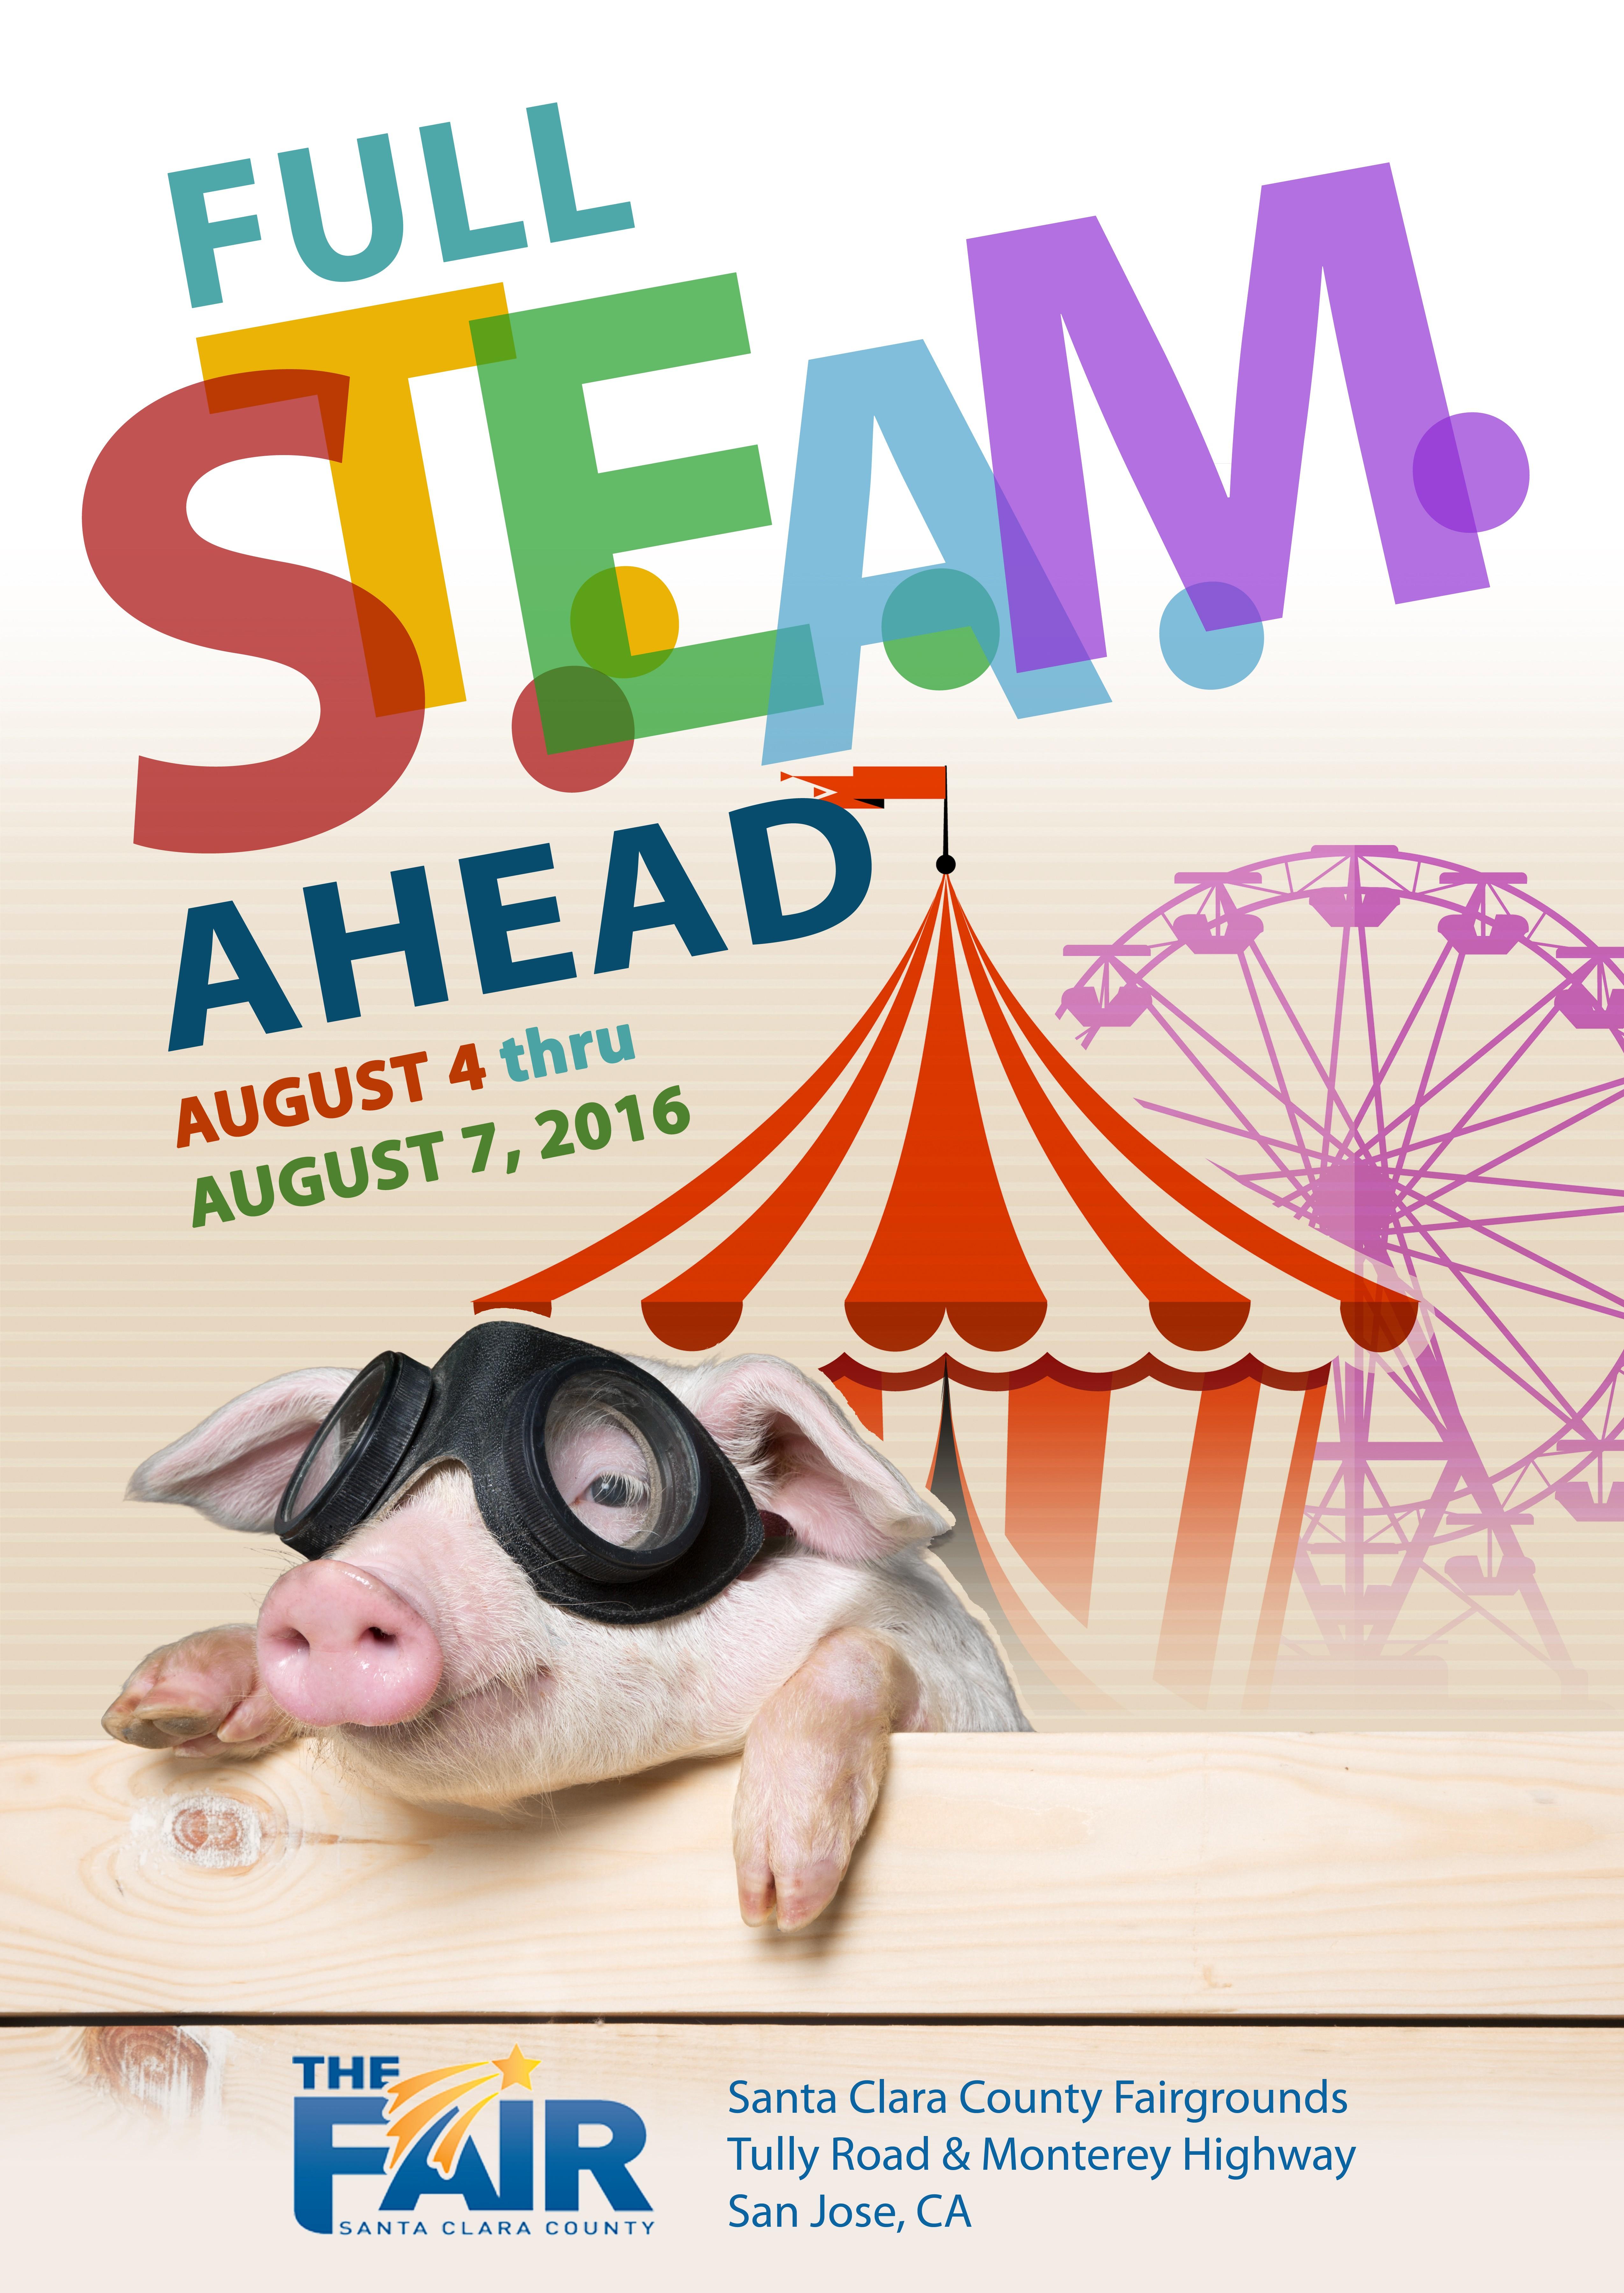 Full S.T.E.A.M Ahead.  Create the poster for the 2016 Santa Clara County Fair!